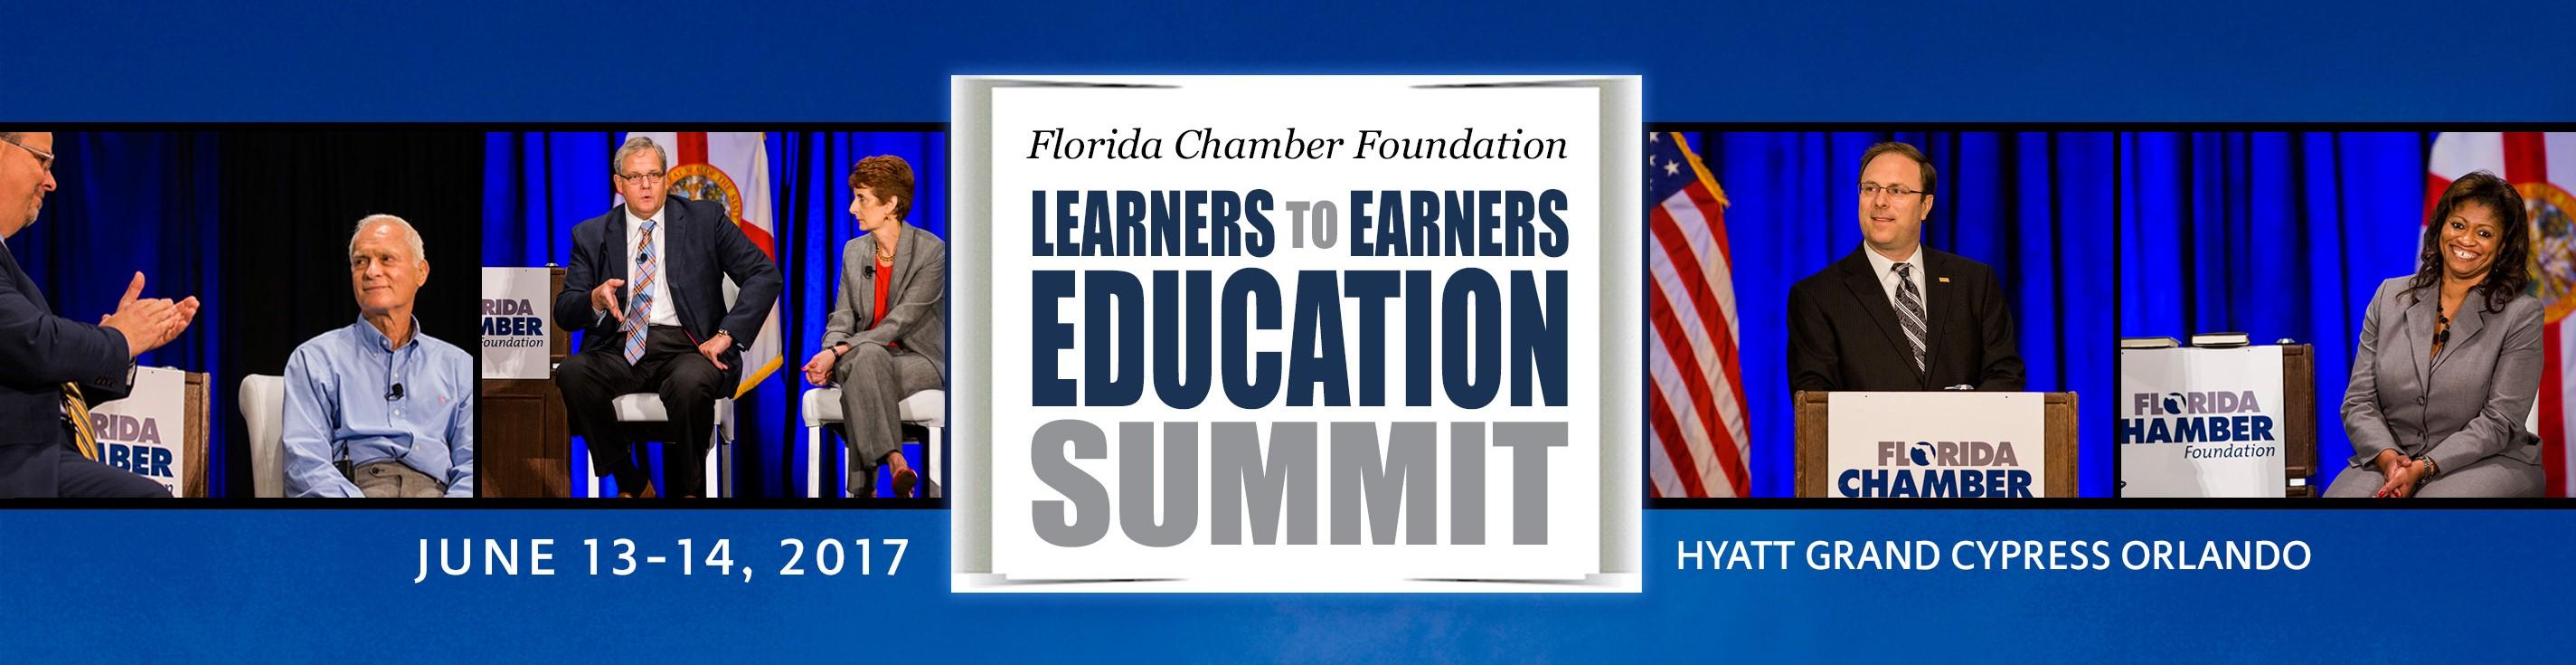 2017 Learners to Earners Education Summit